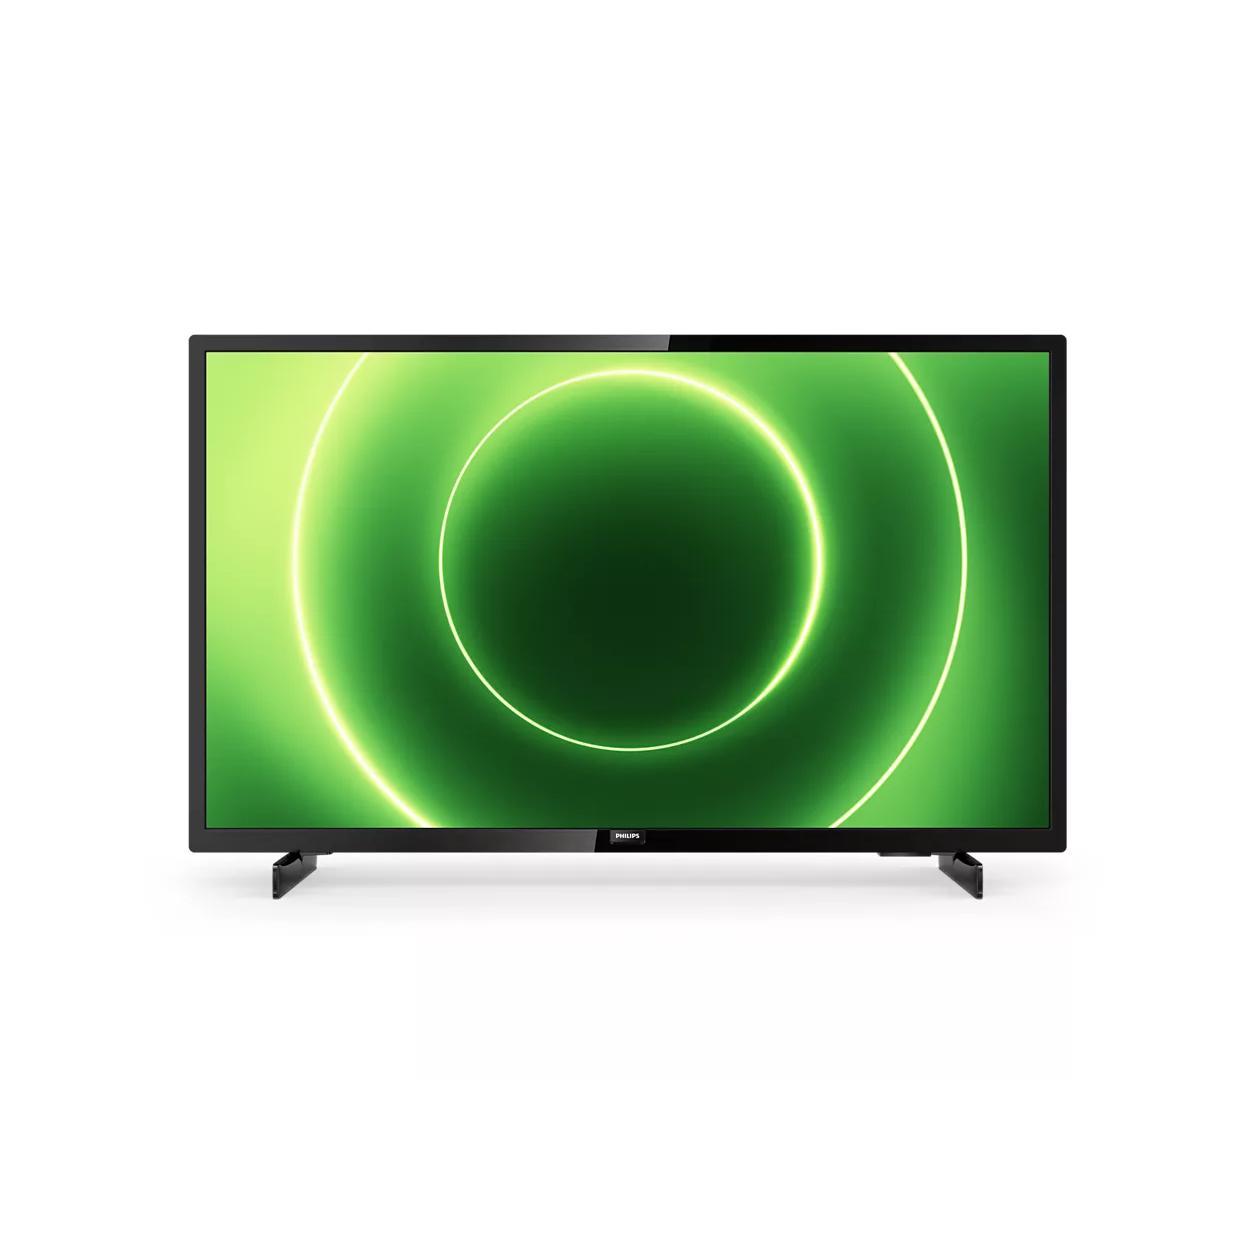 TV Philips LED Full HD 1080p 81 cm 32PFS6805/12